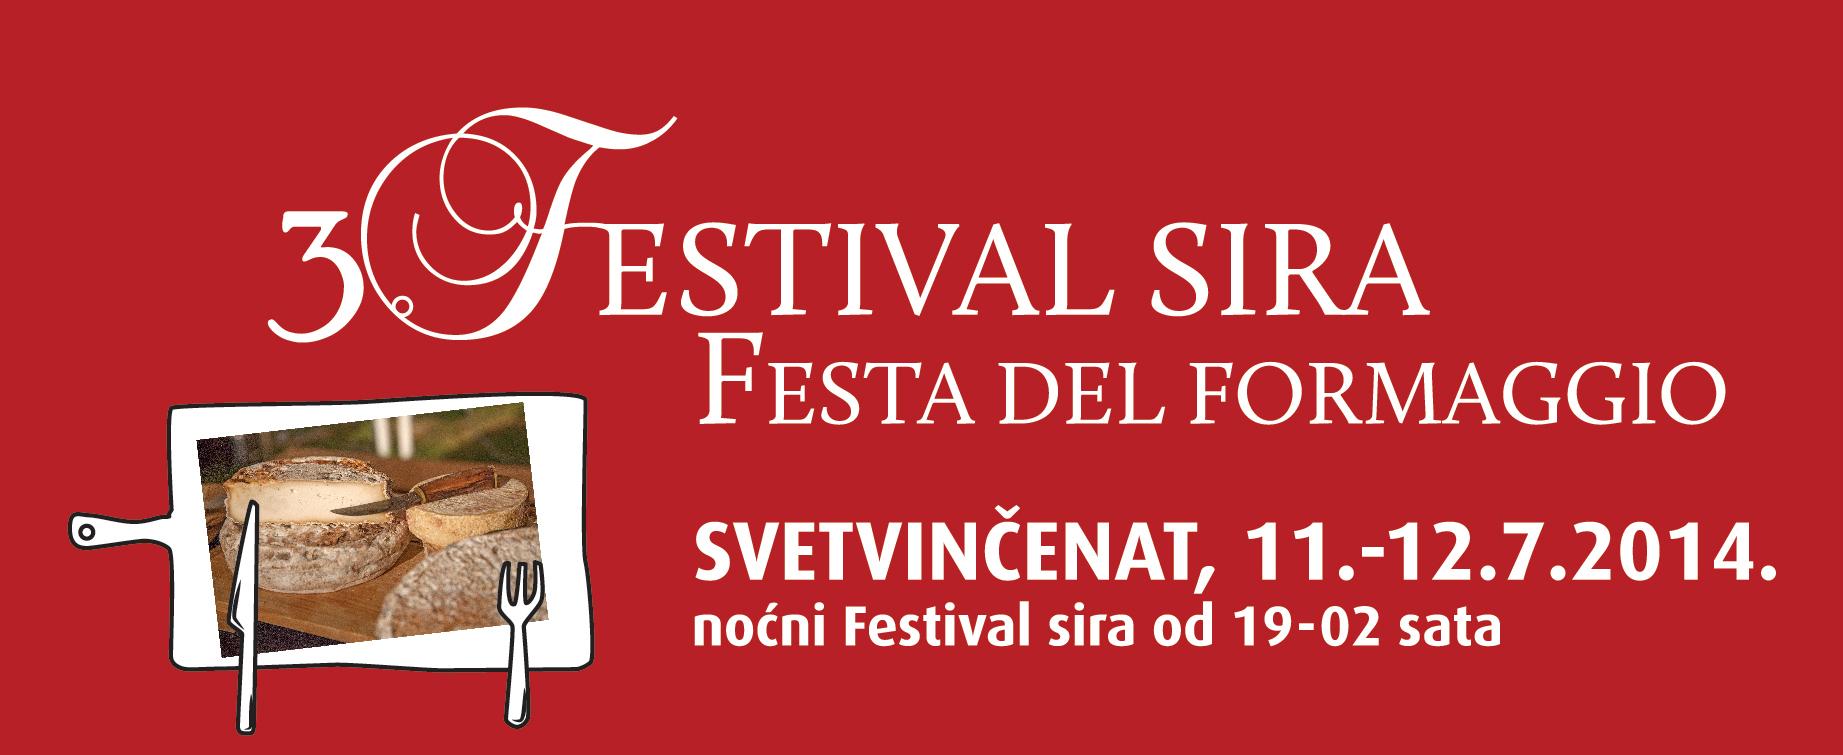 3. Festival sira